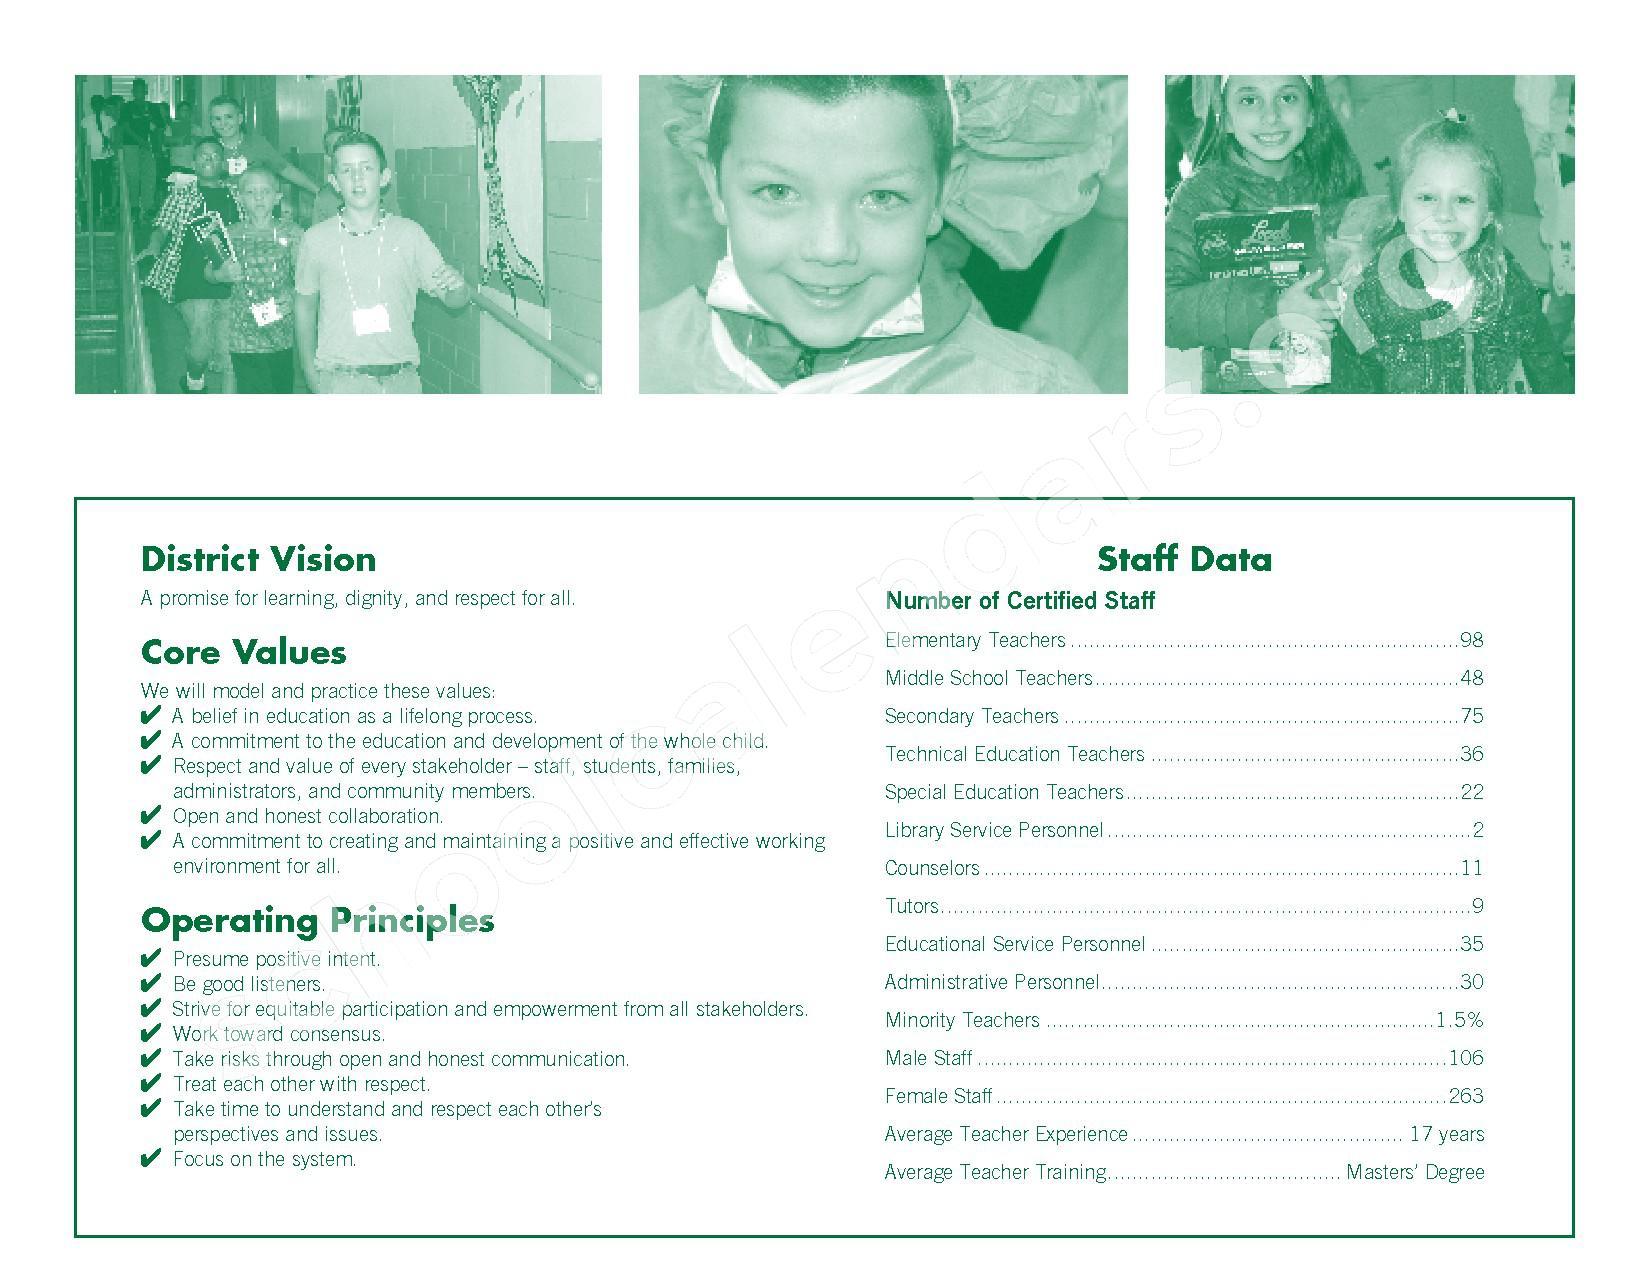 2016 - 2017 Mayfield Activities Calendar – Mayfield City Schools – page 4